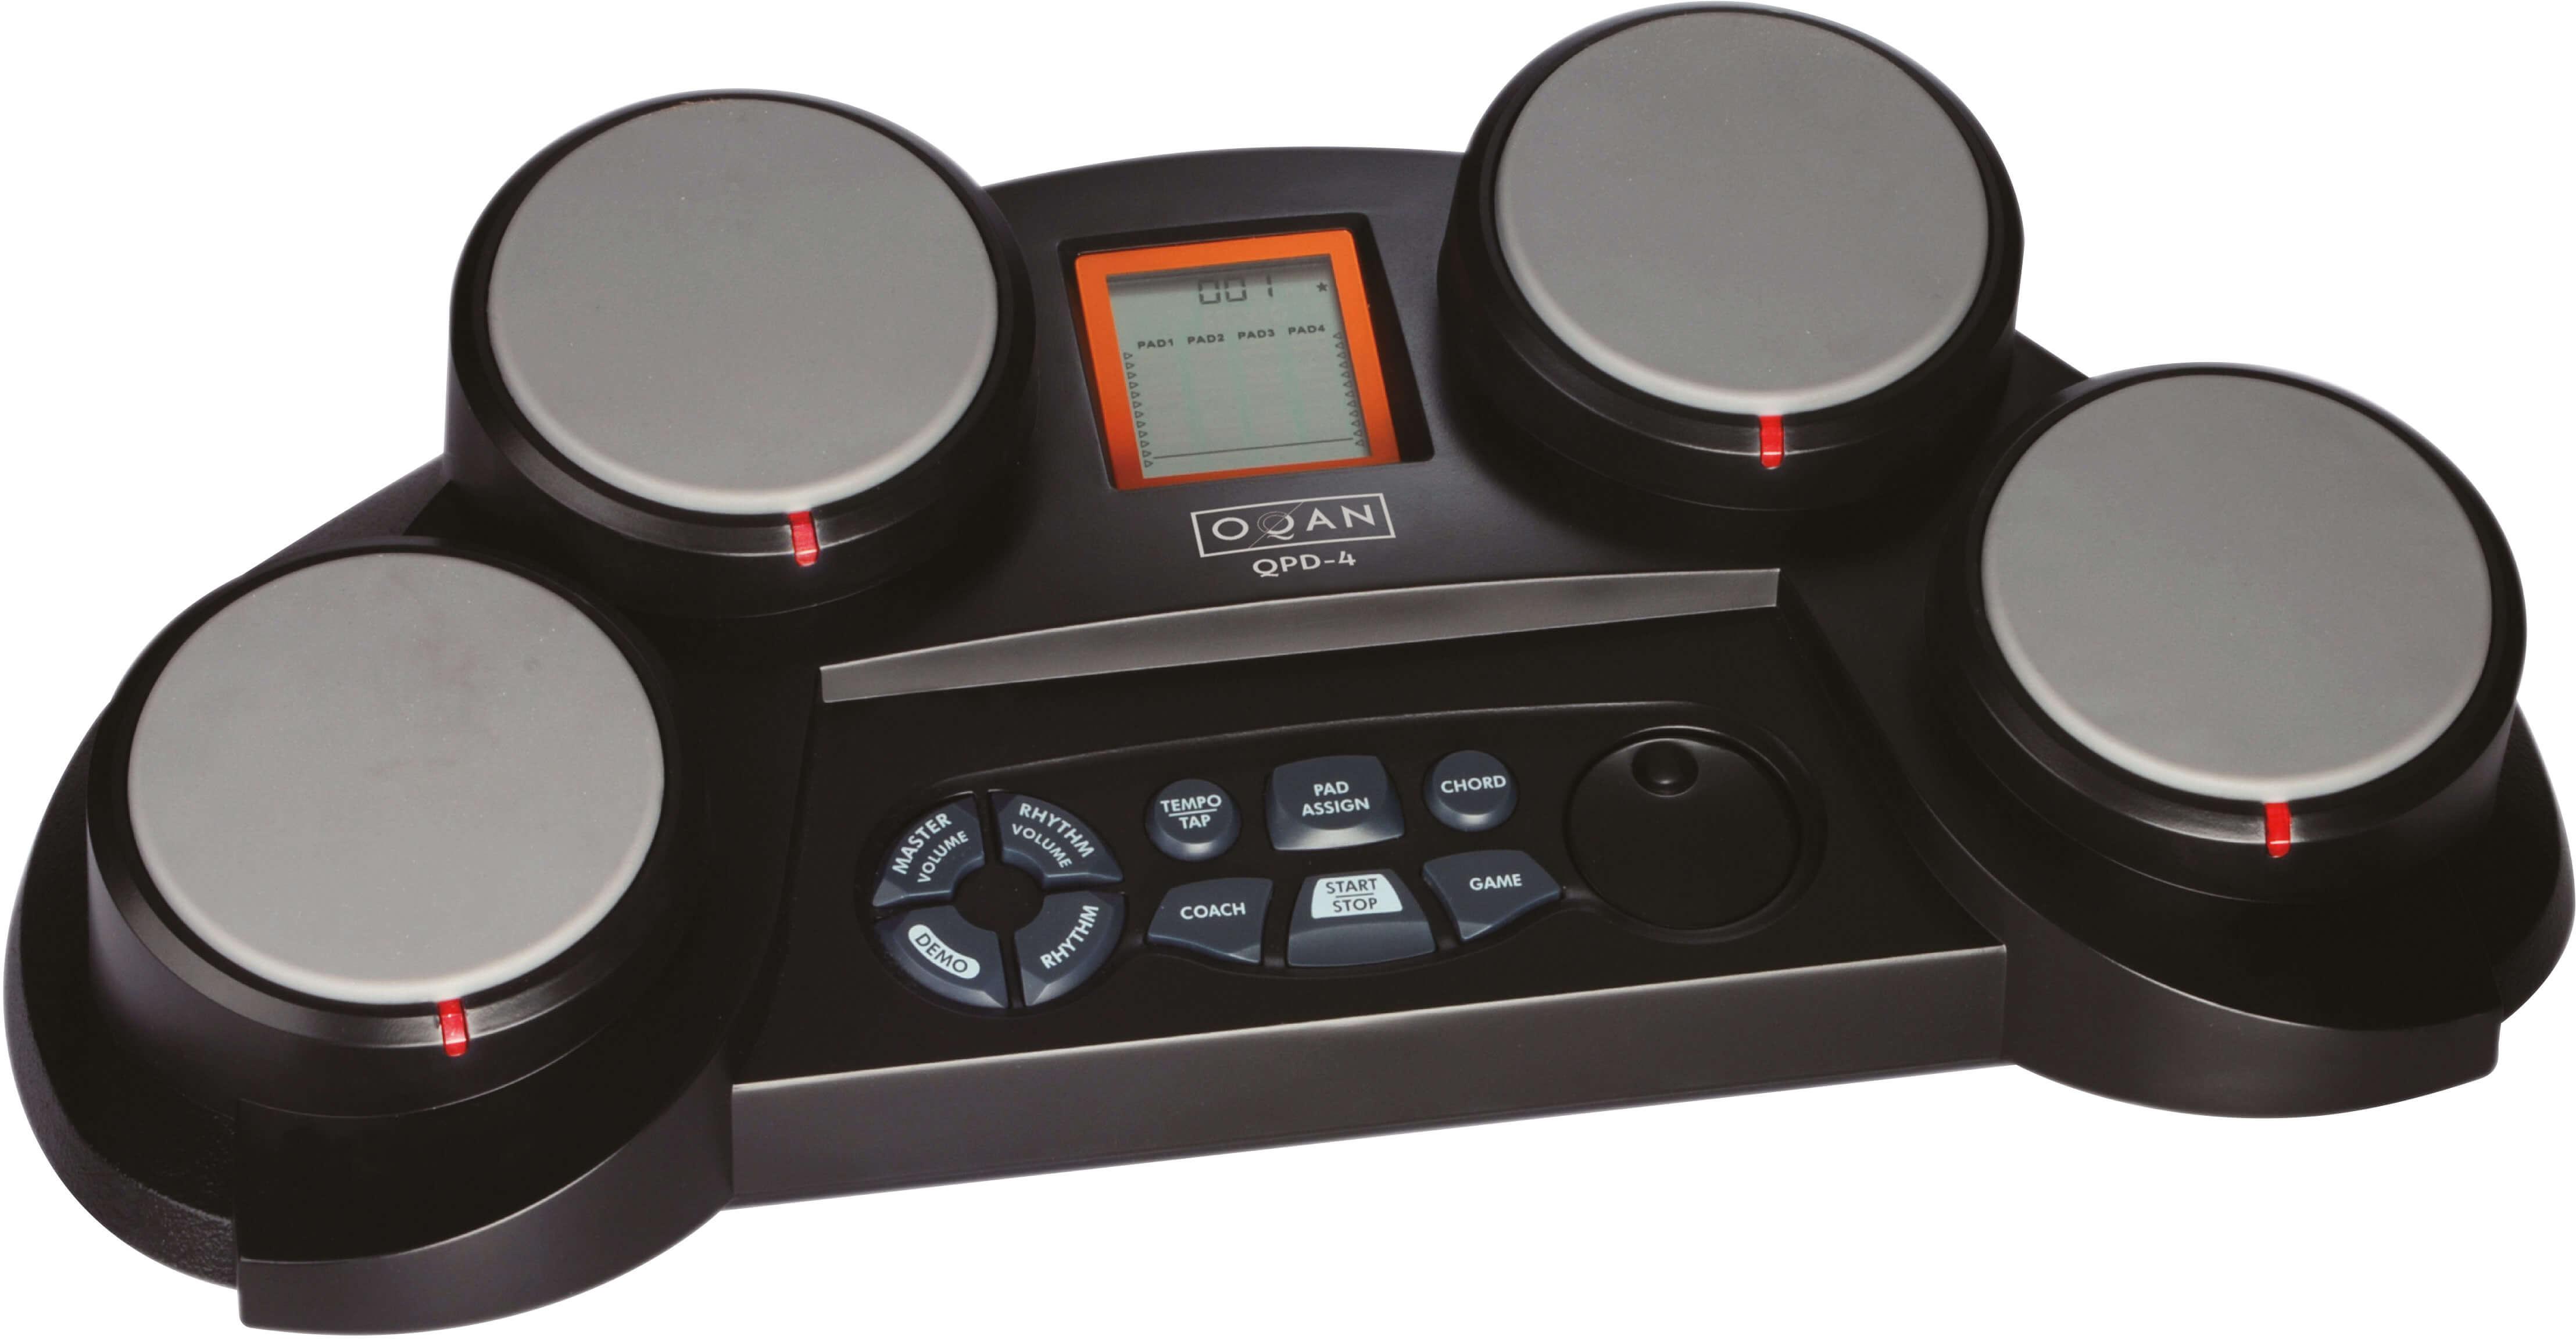 Batería Electrónica Oqan Qpd-4 Compact Drum